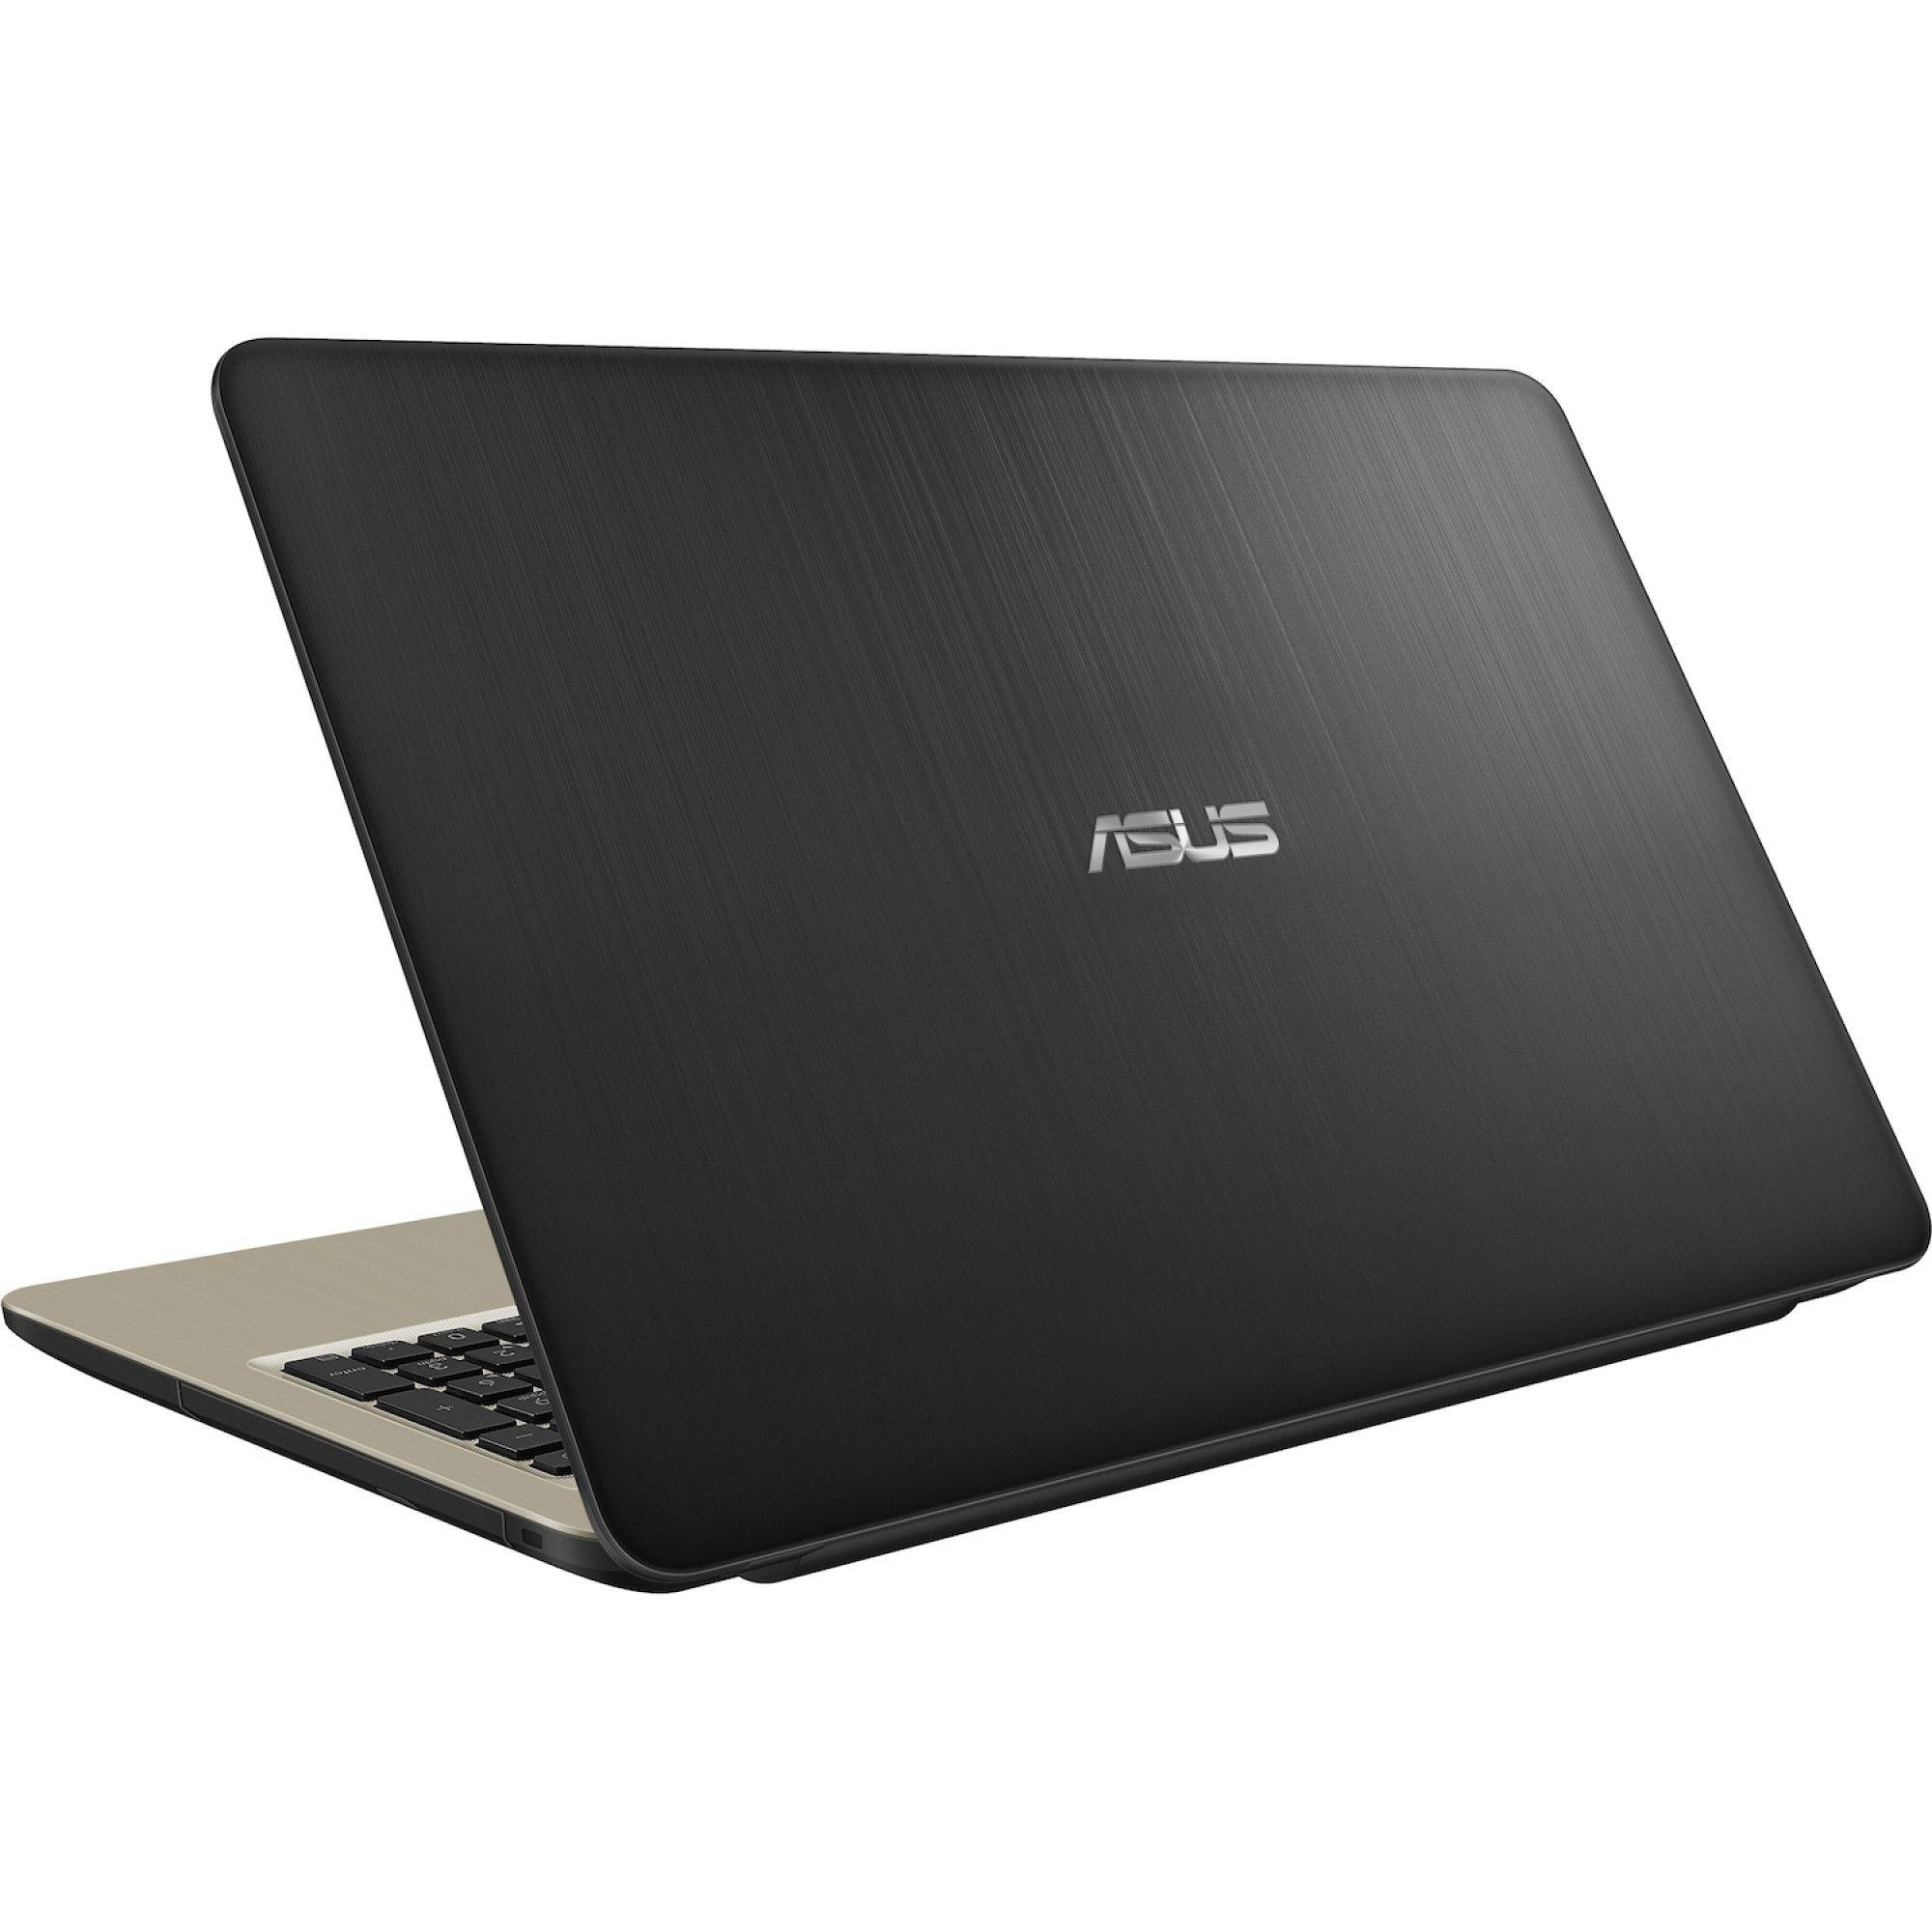 "Лаптоп Asus X540NV-DM052 - 15.6"" Full HD - 3"